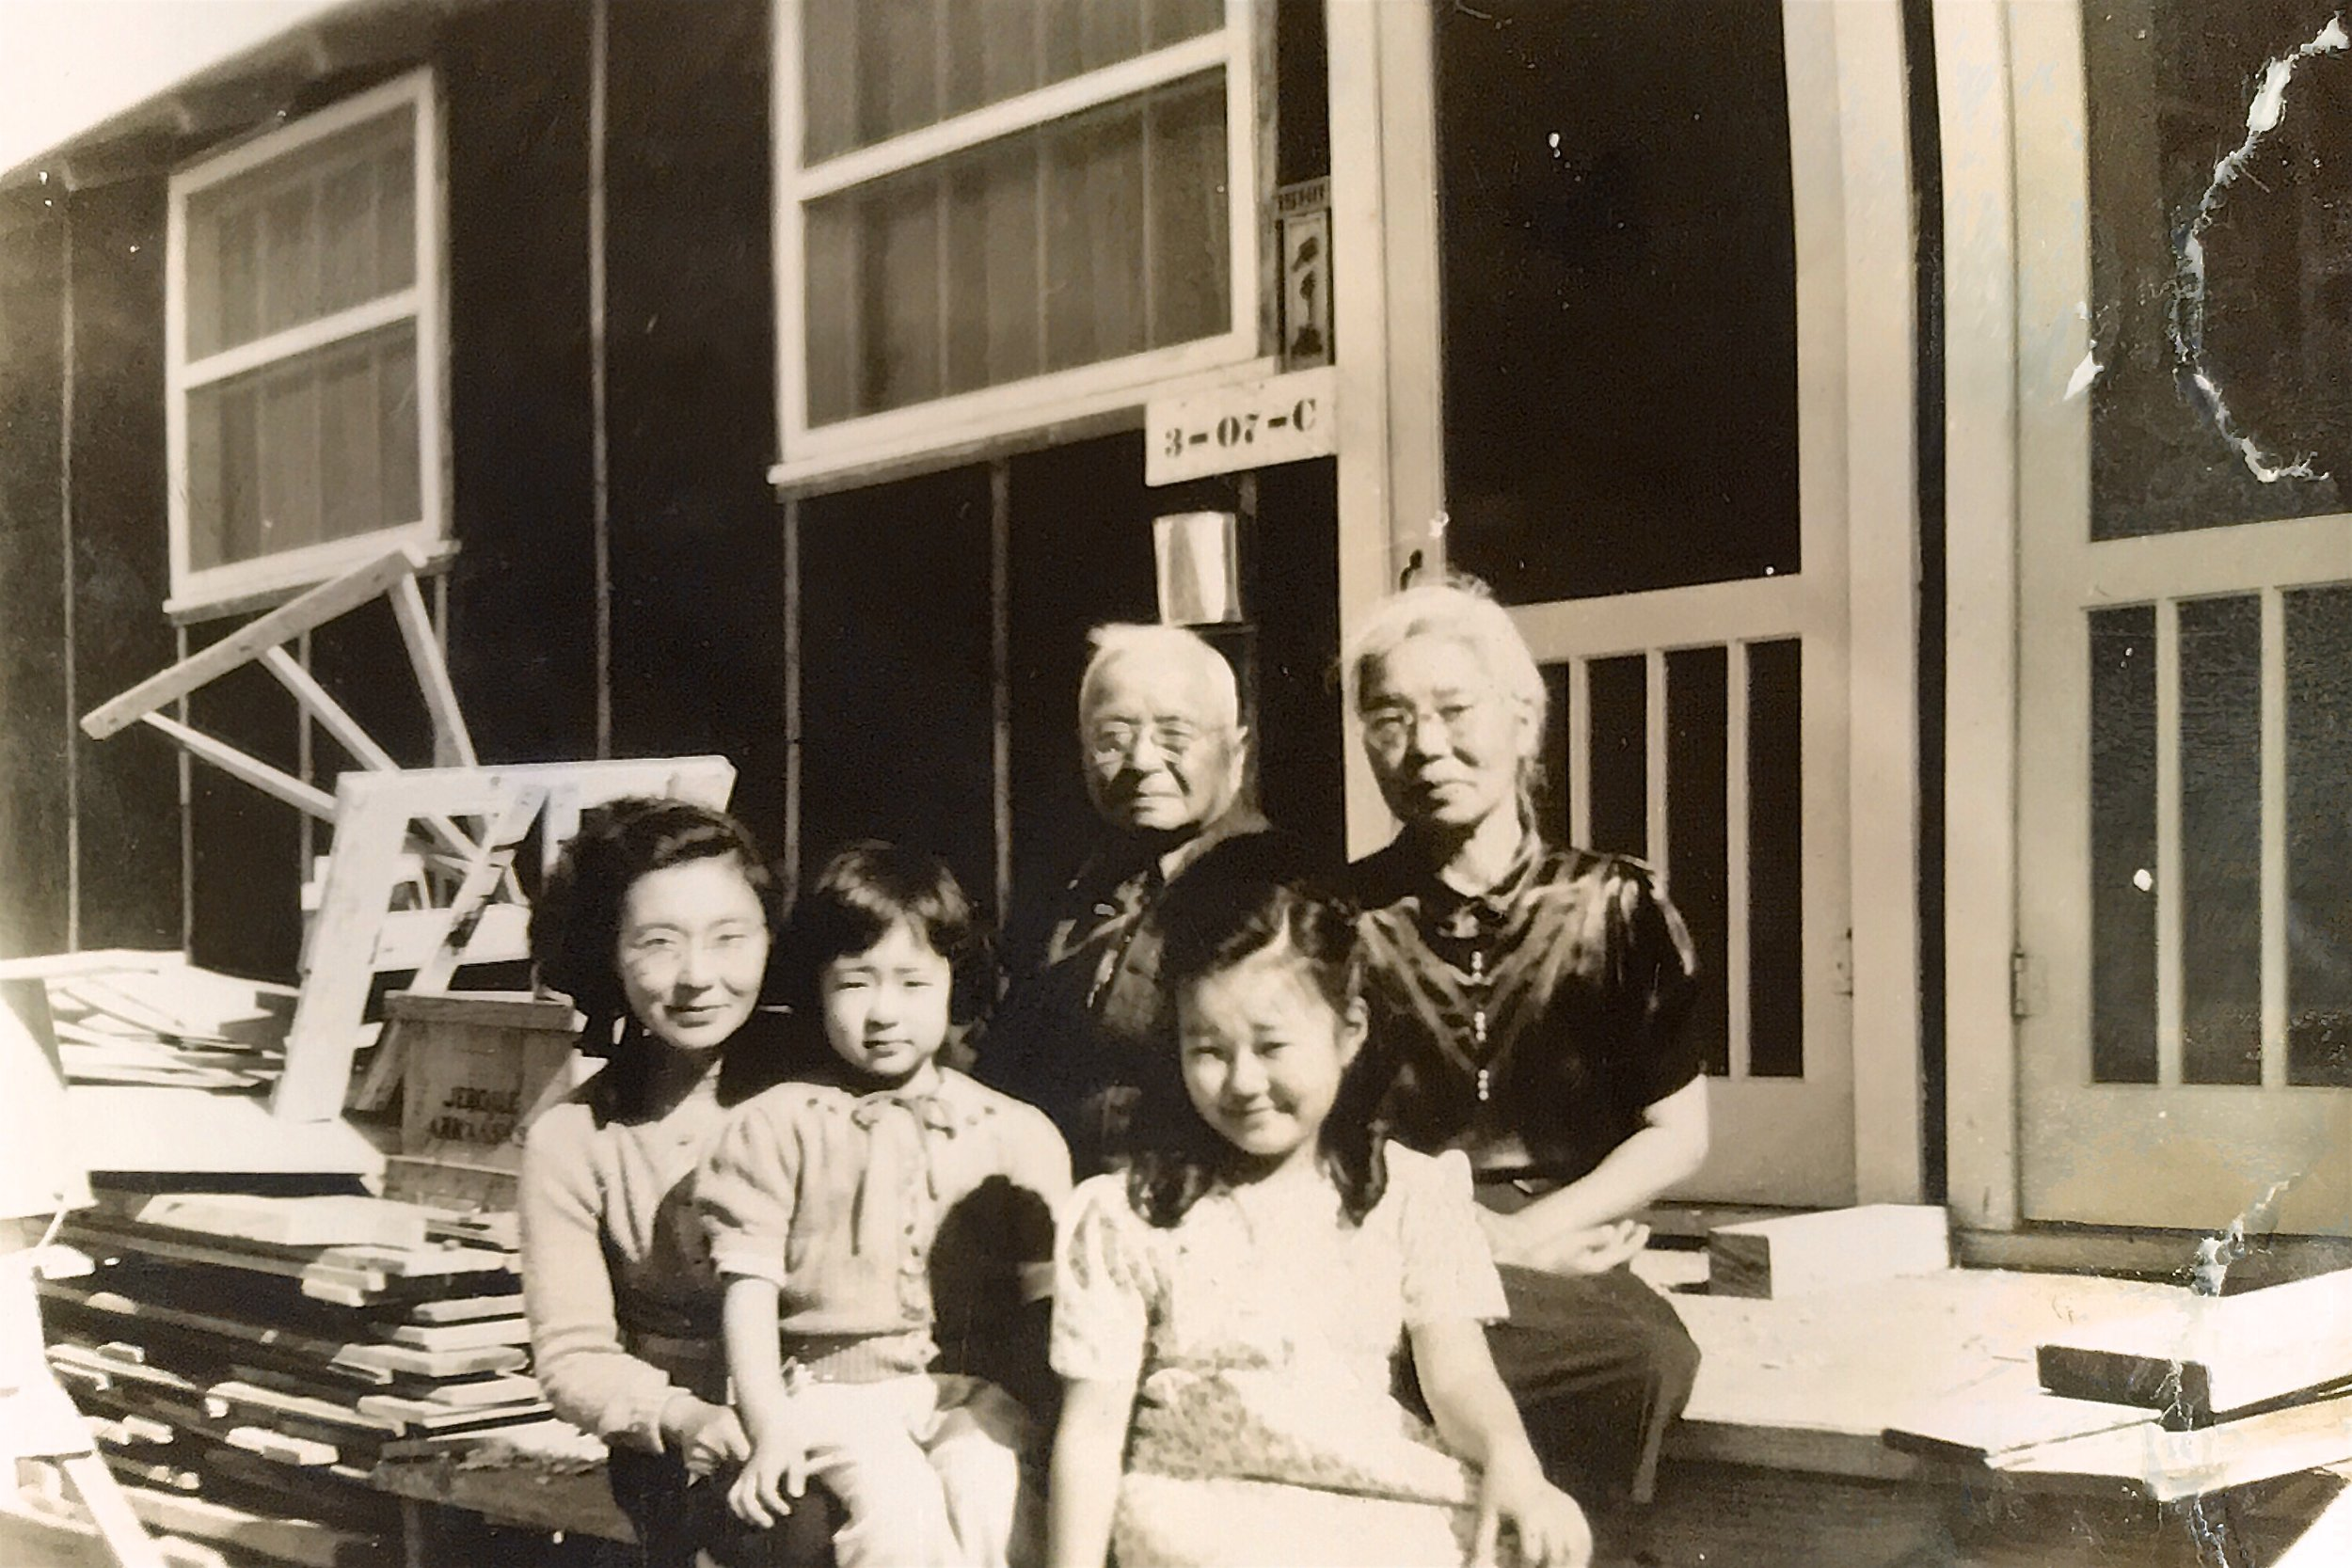 Hisa, Kiyo, Matsutaro (Henry), Frances, and Aki. Henry and Aki were my grandmother's parents.